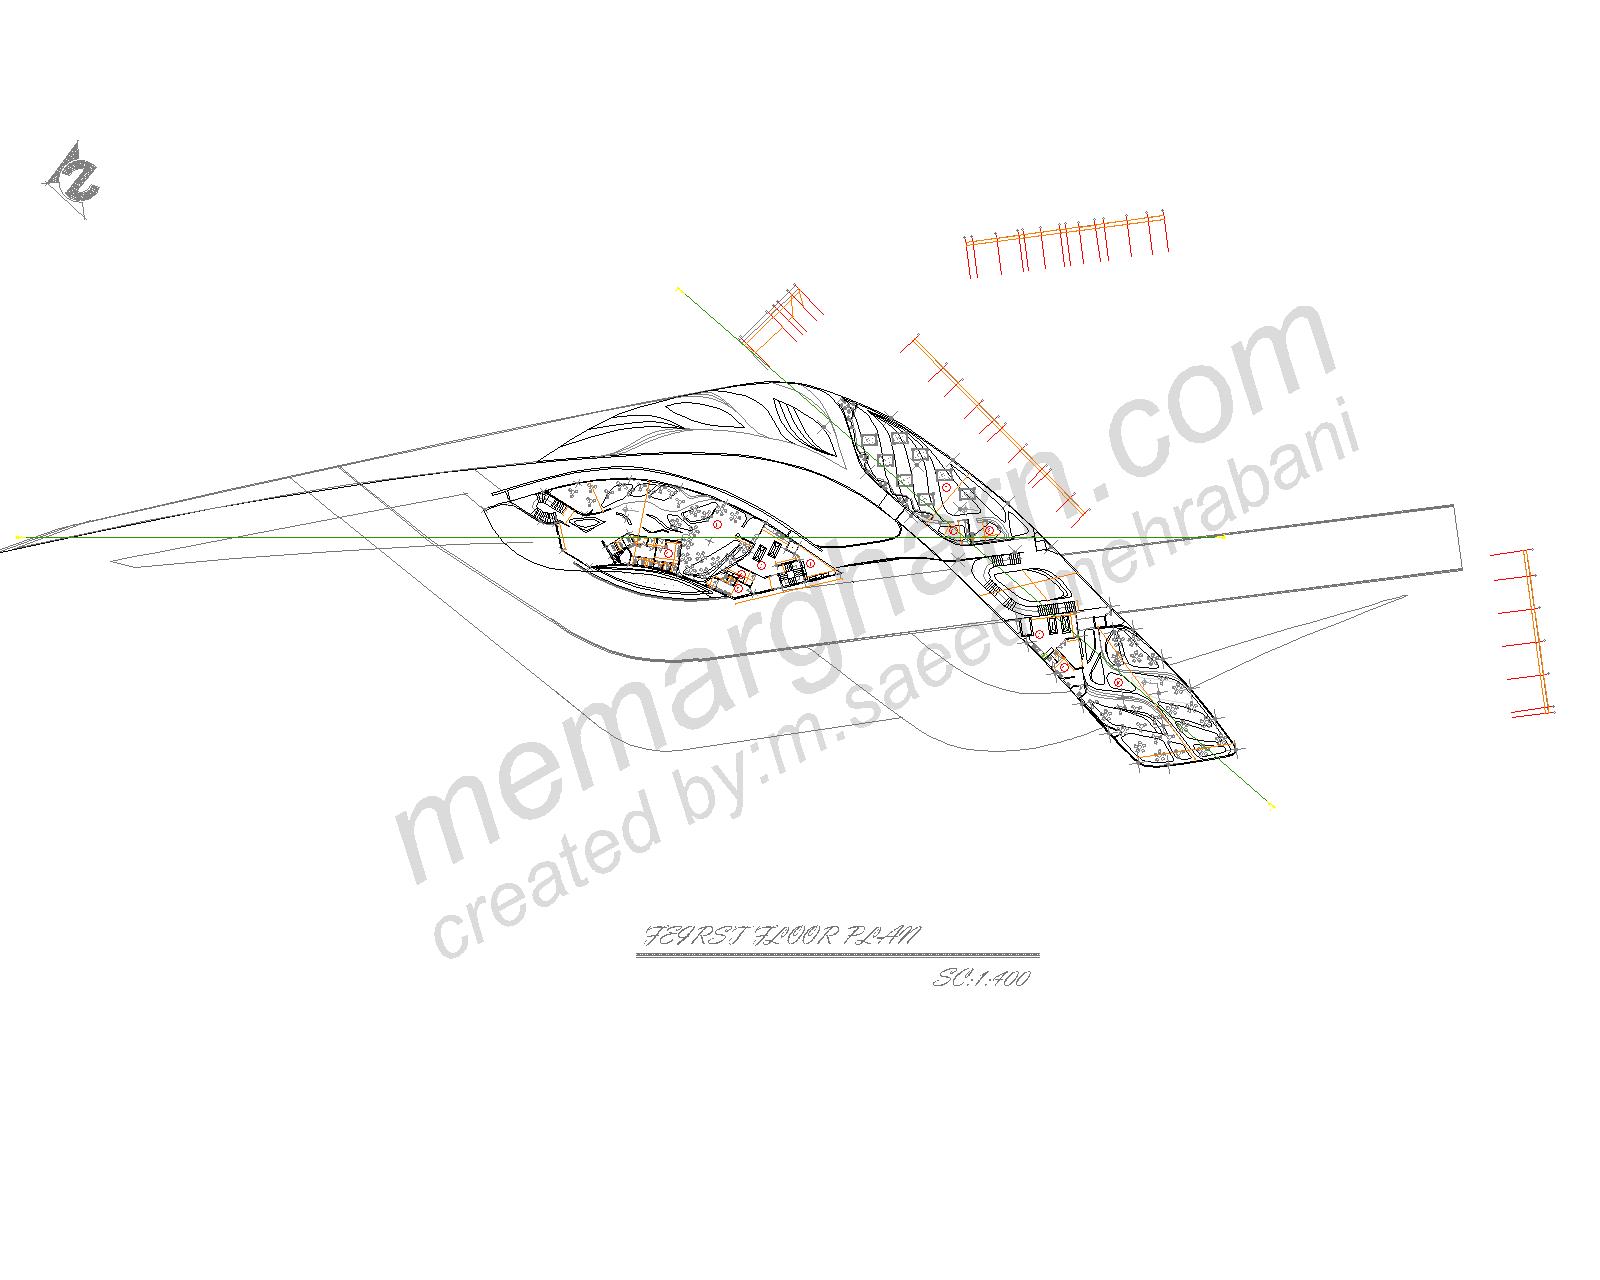 اسکله دریایی و پلاژ